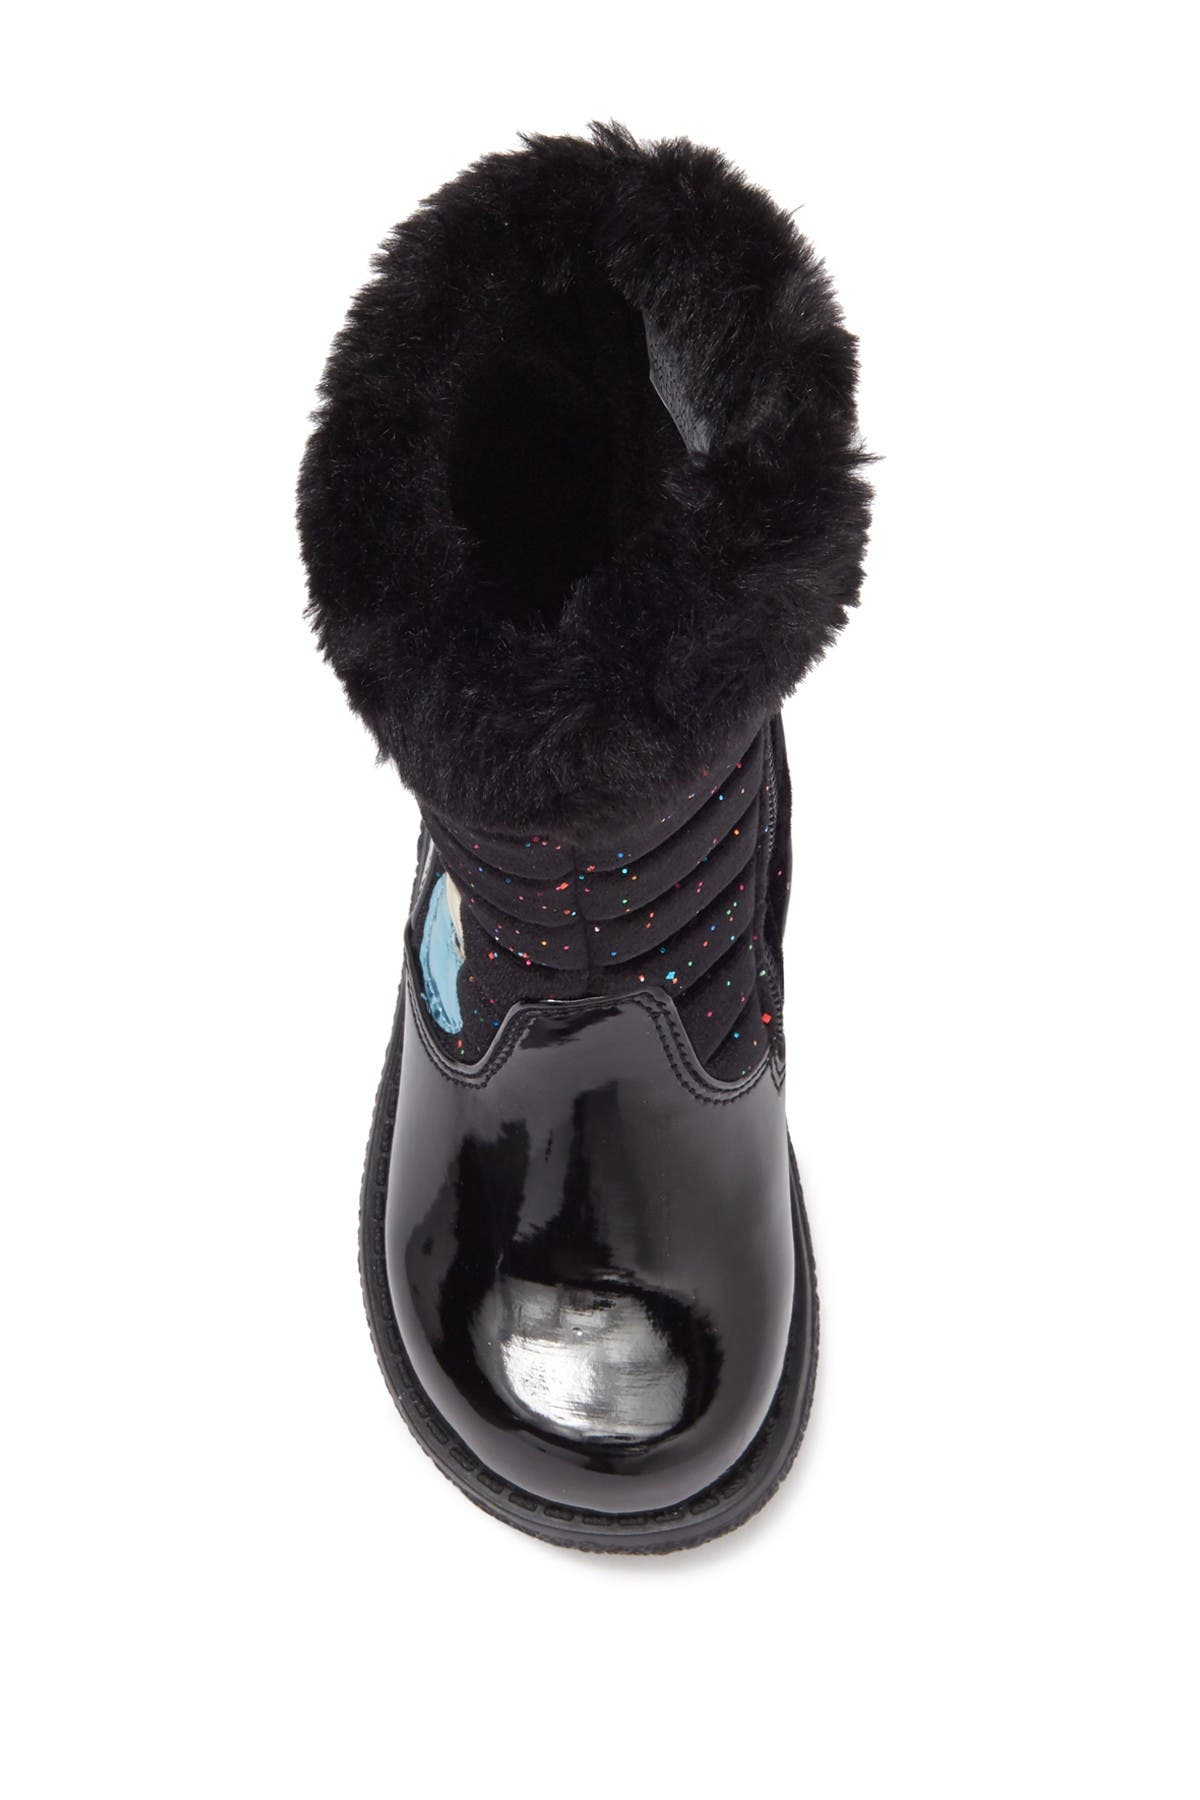 Rachel Shoes Libby Faux Fur Trim Quilted Boot